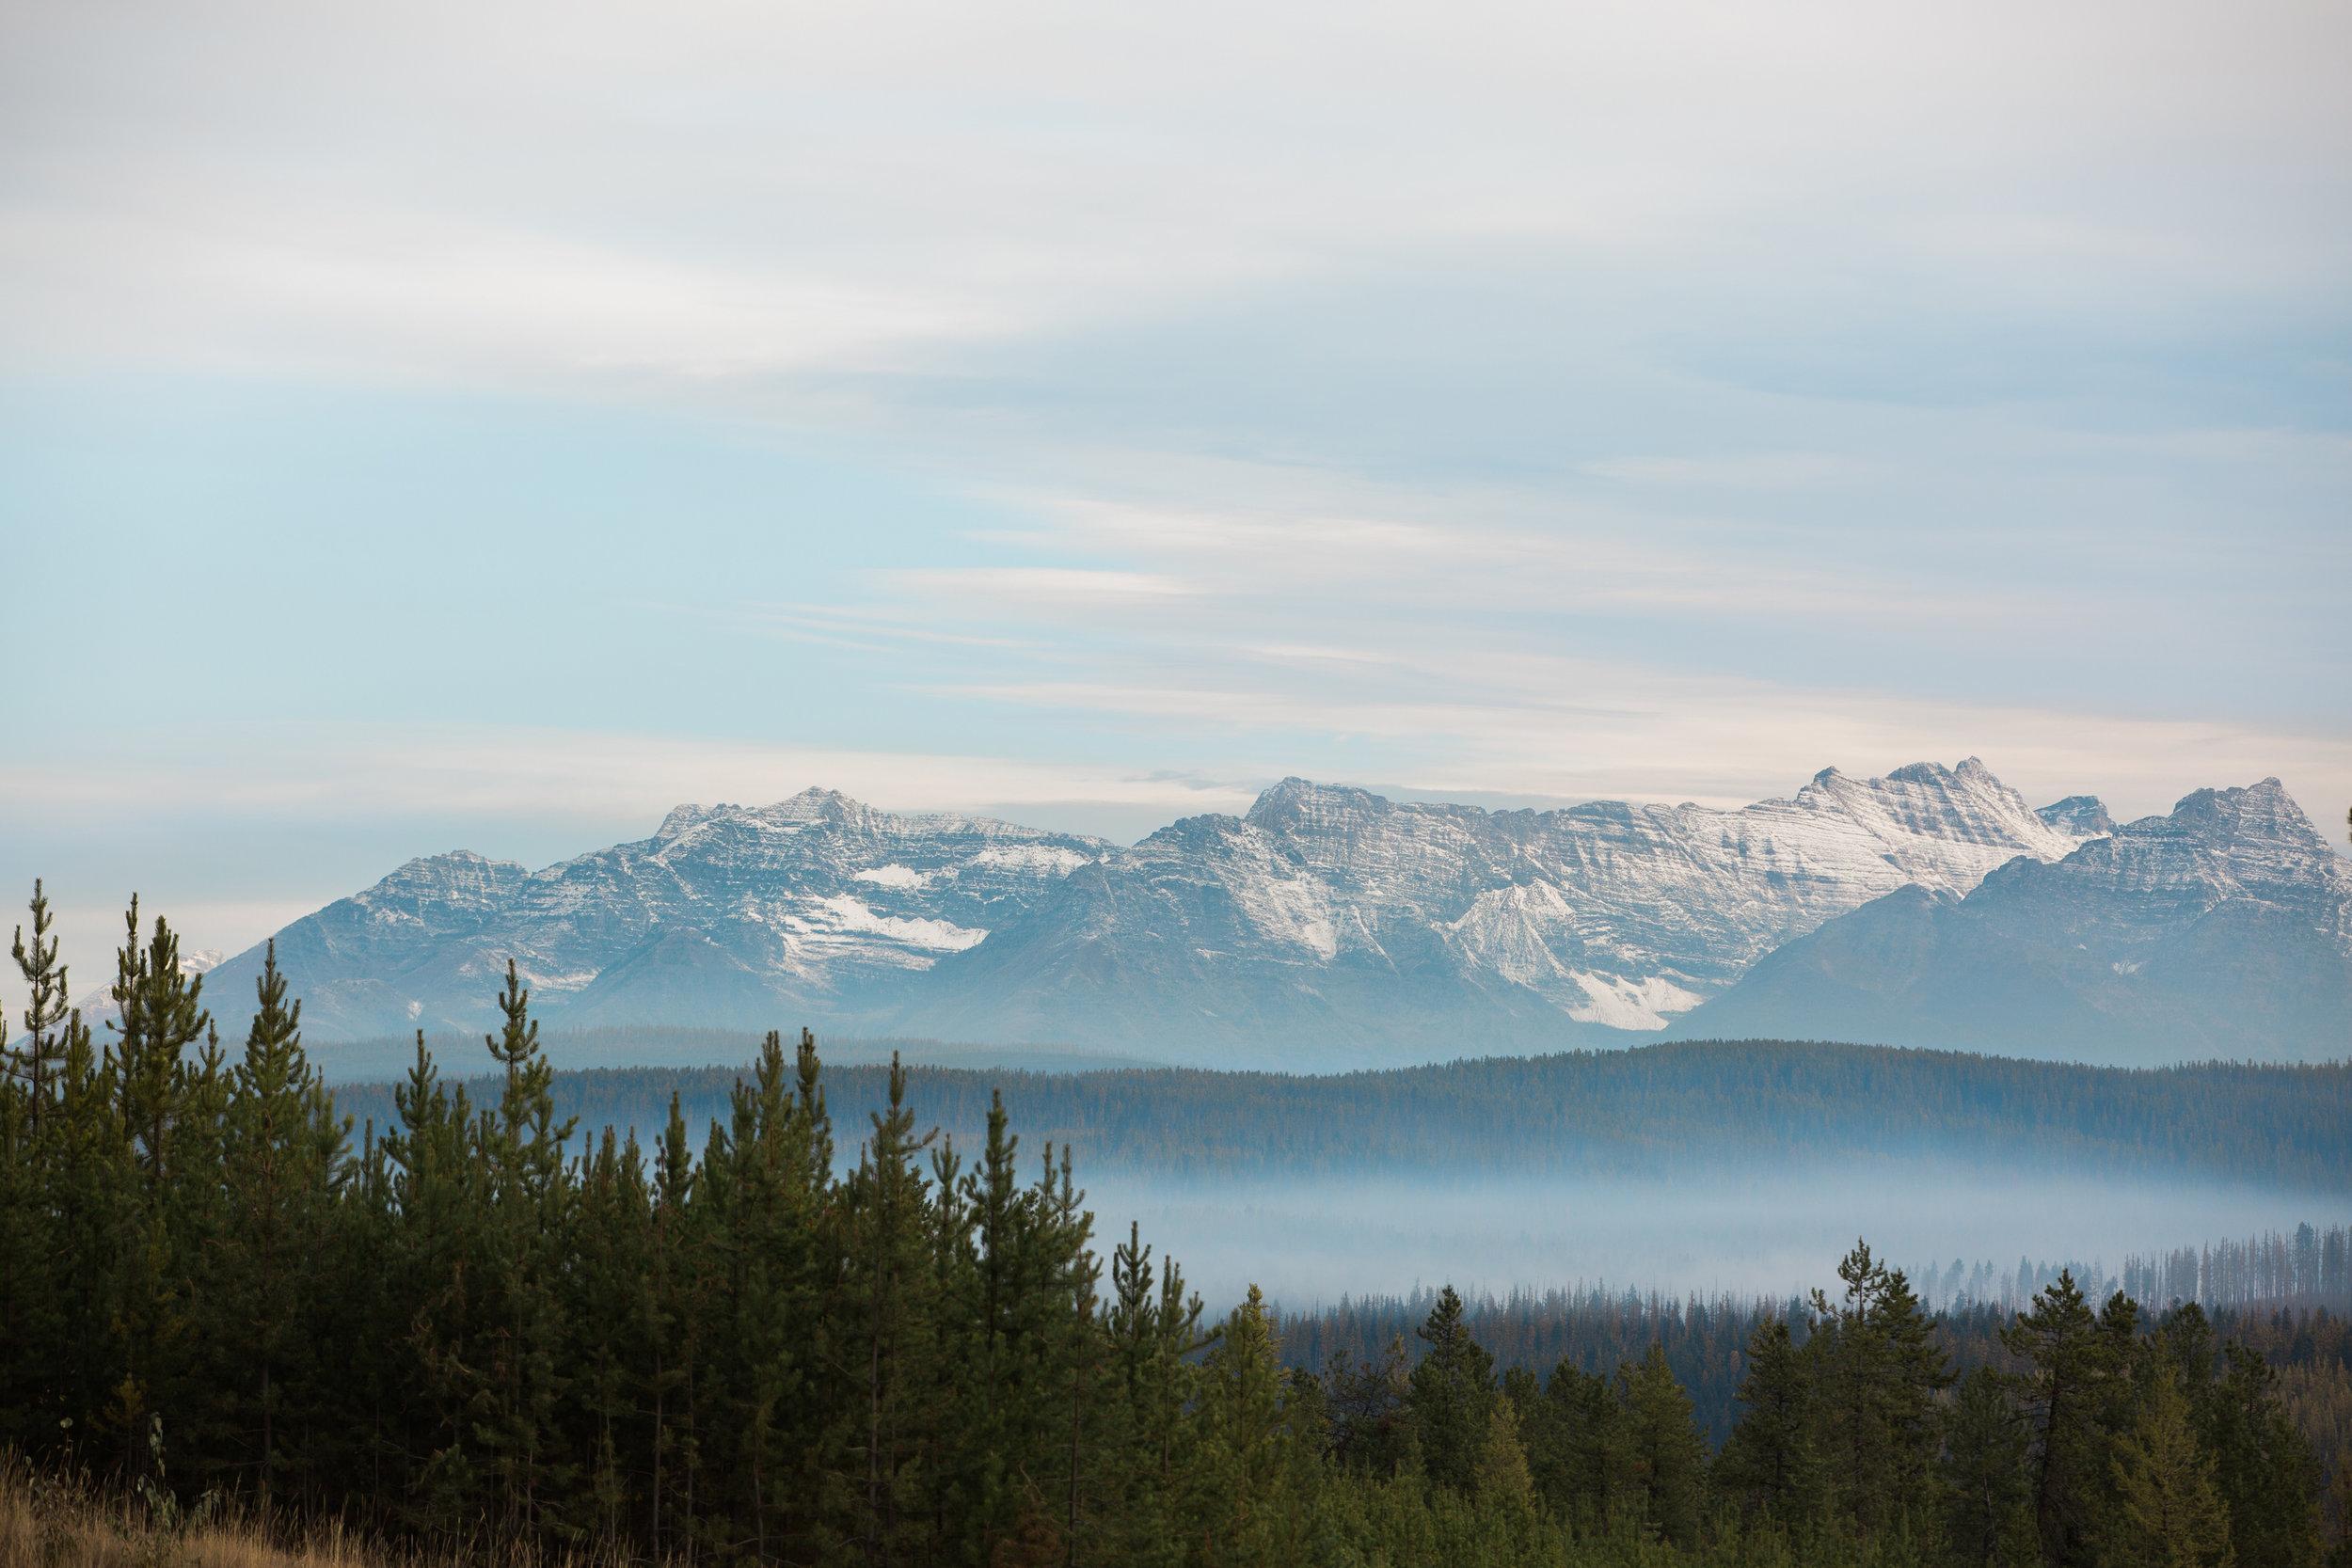 CindyGiovagnoli_Glacier_National_Park_Montana_mountains_lake_fall_autumn_road_trip-023.jpg